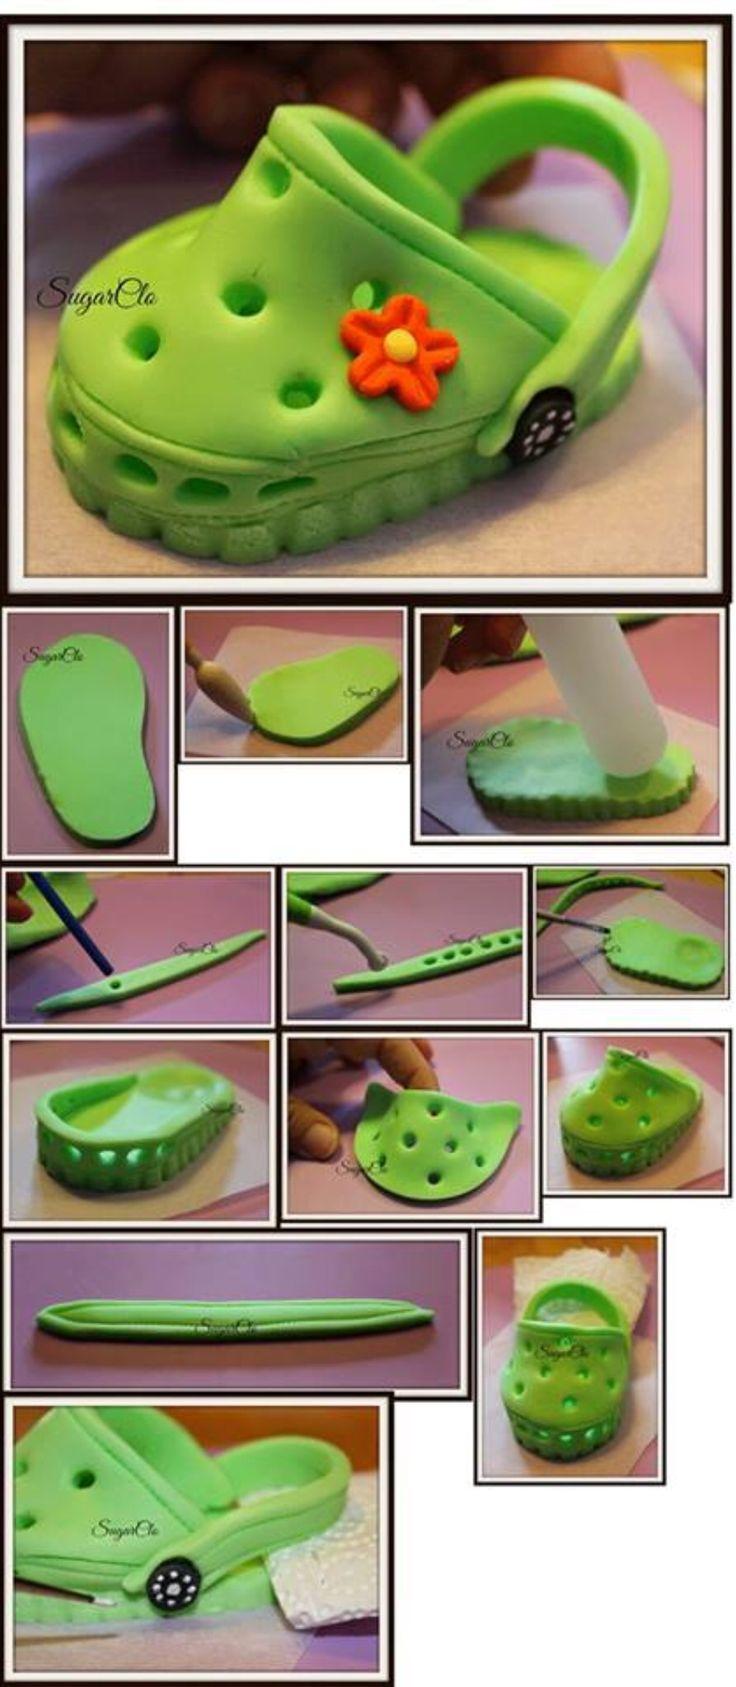 Fondant baby croc shoe tutorial Marilee *lived* in her green baby crocs.  #pinyourlove #picmonkey